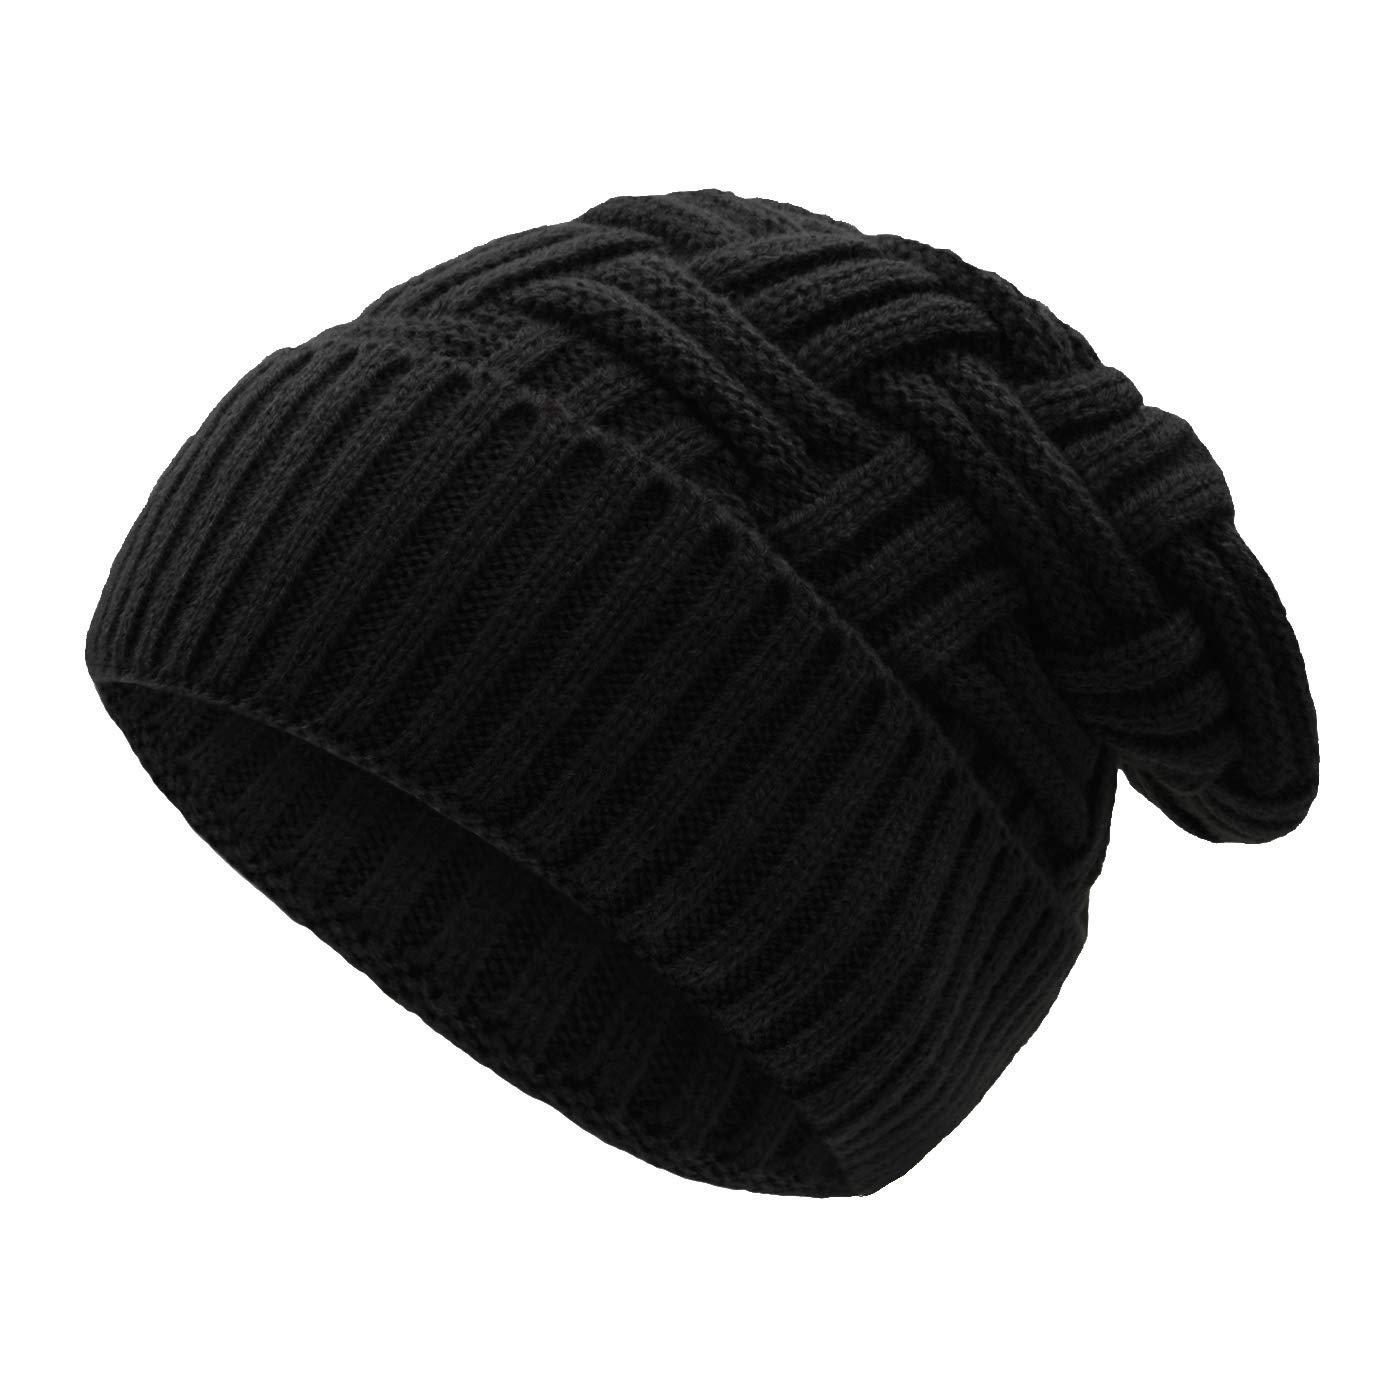 1a403daf039 UPhitnis Winter Beanie Hat for Men Women